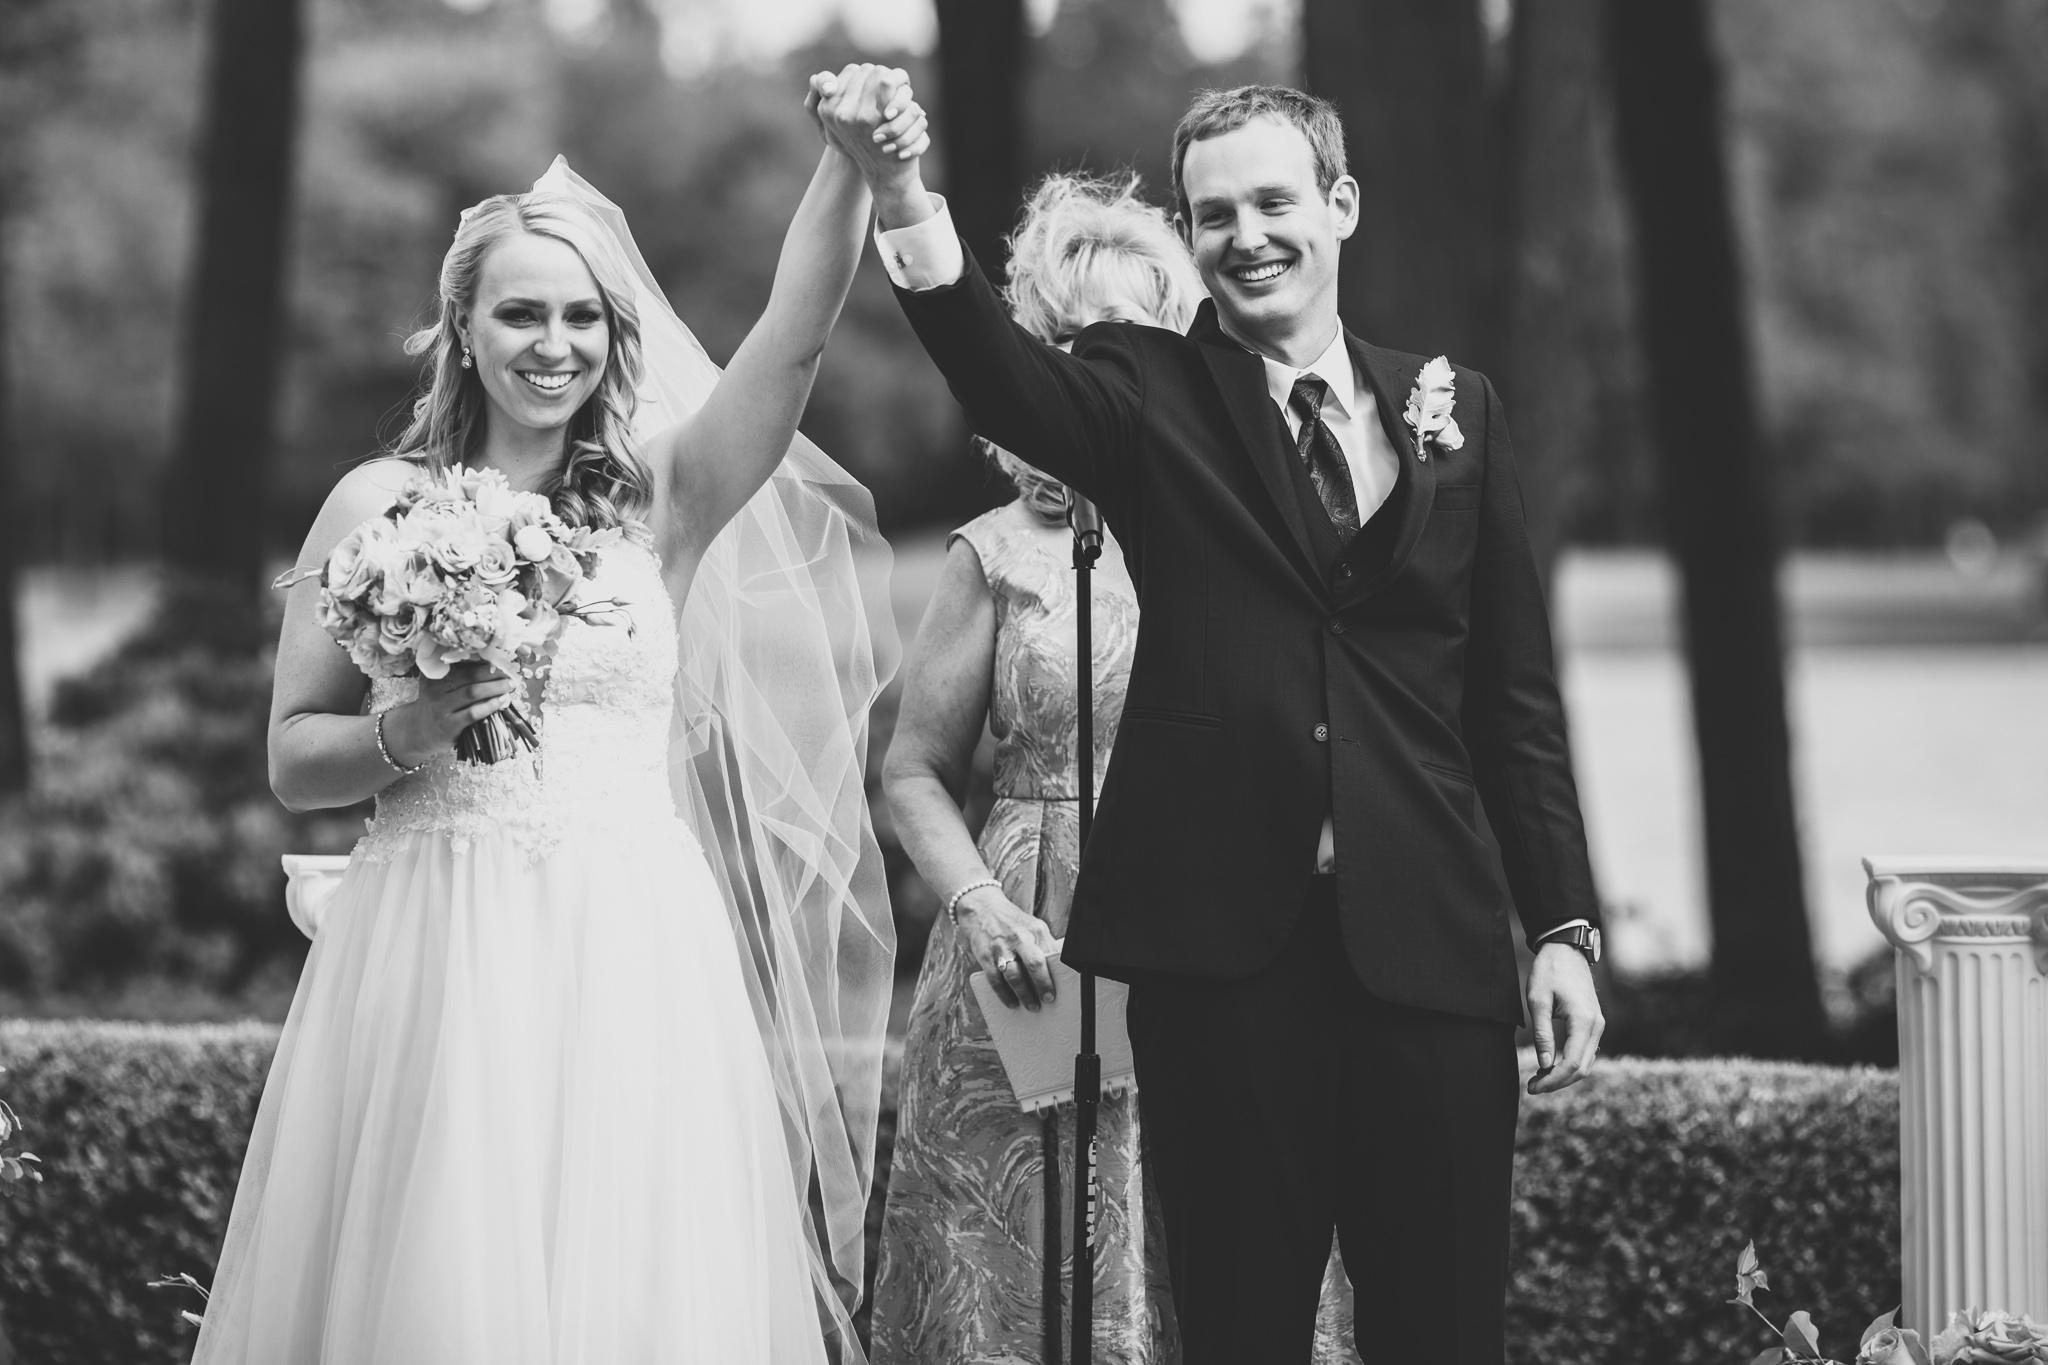 099-best-detroit-michigan-outdoor-wedding-photographer.jpg